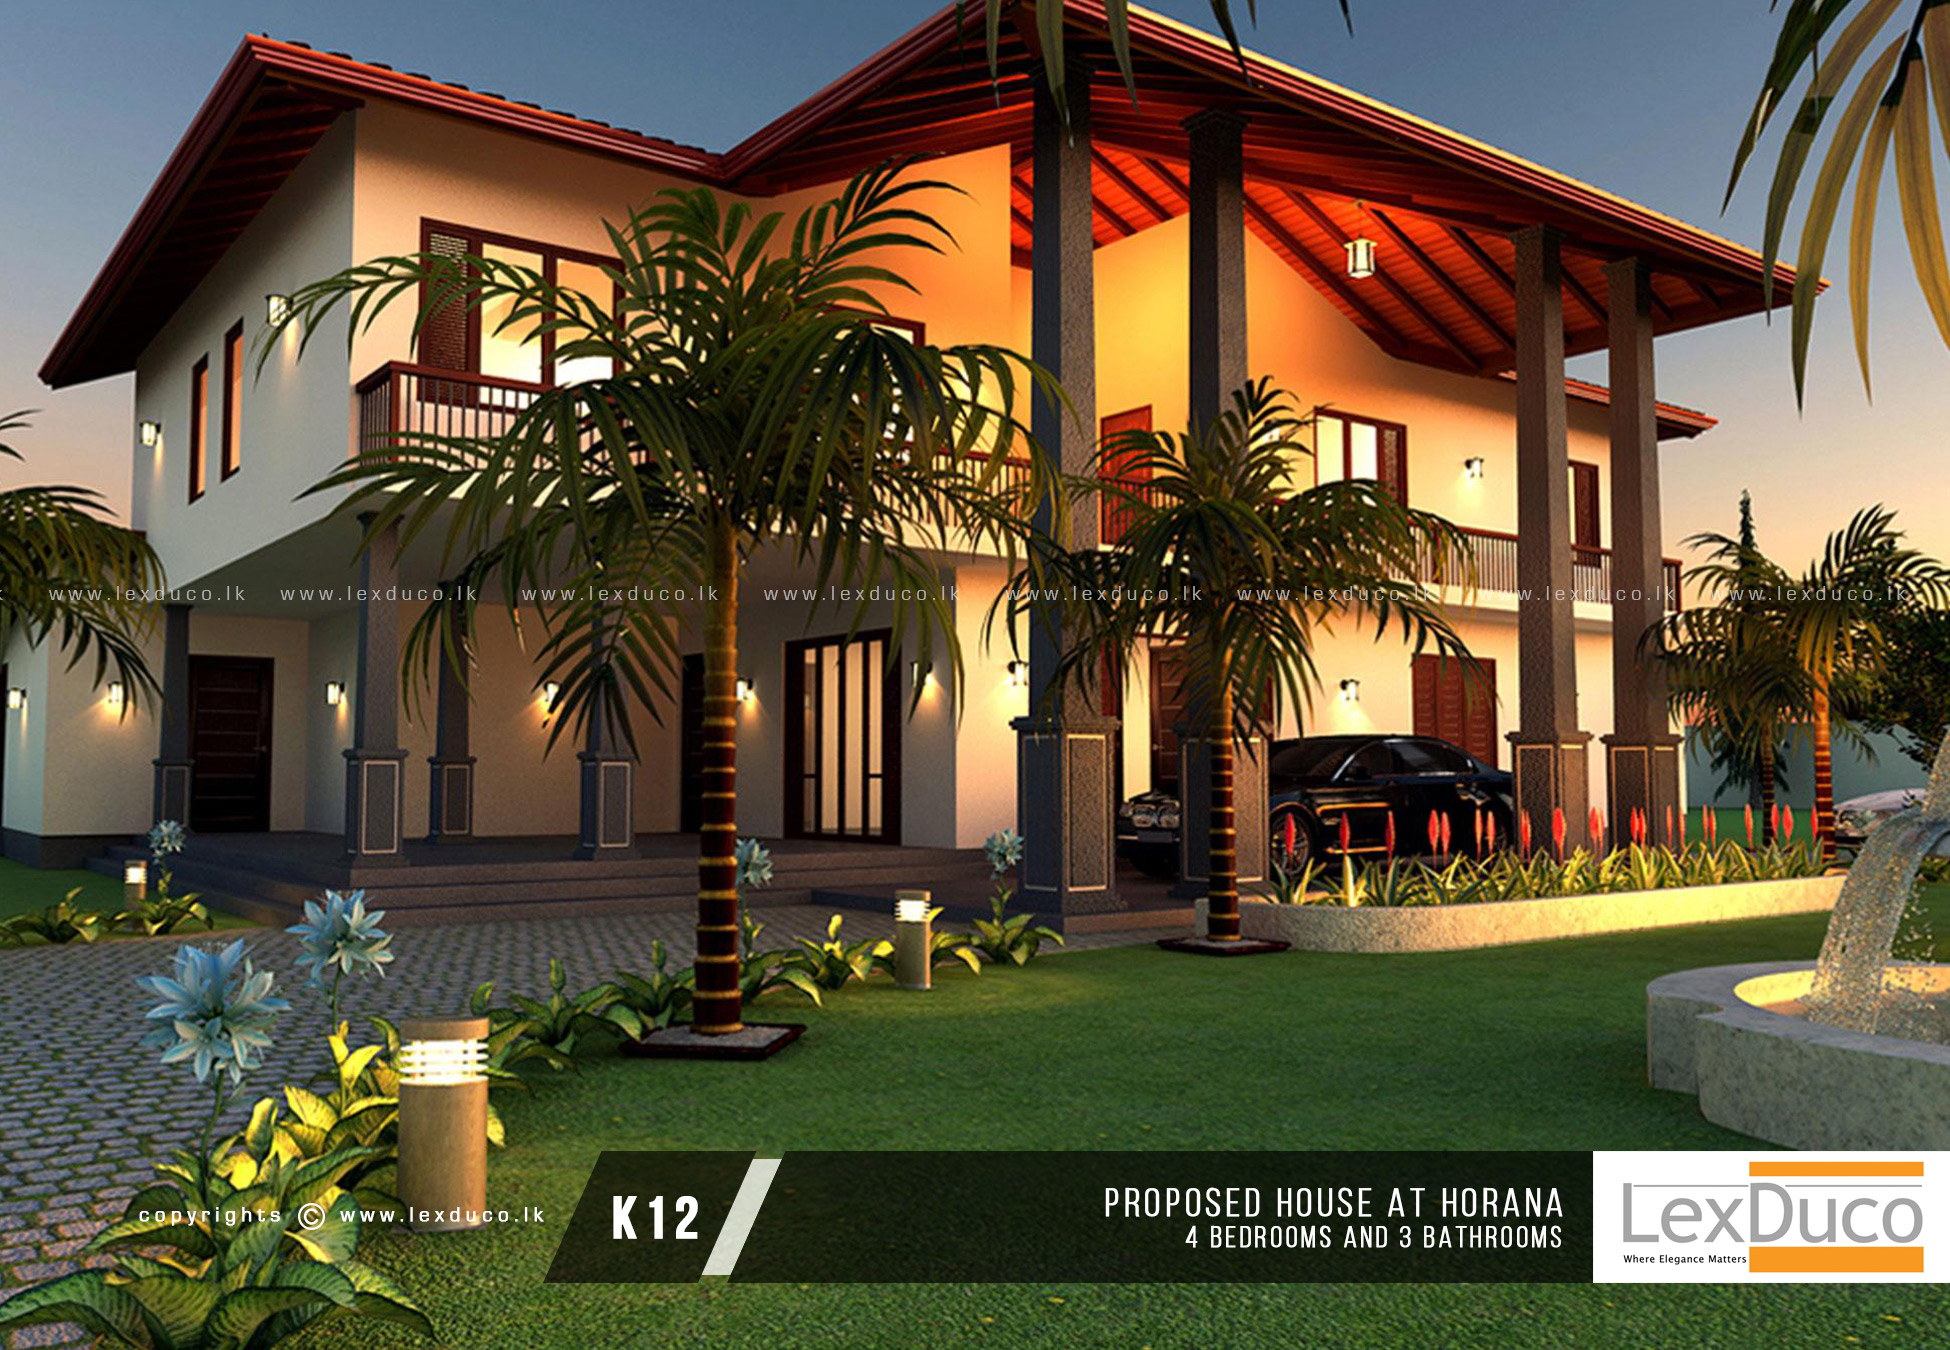 1 House Builders In Sri Lanka 1 Home House Design Amp Build Company In Sri Lanka Lex Duco